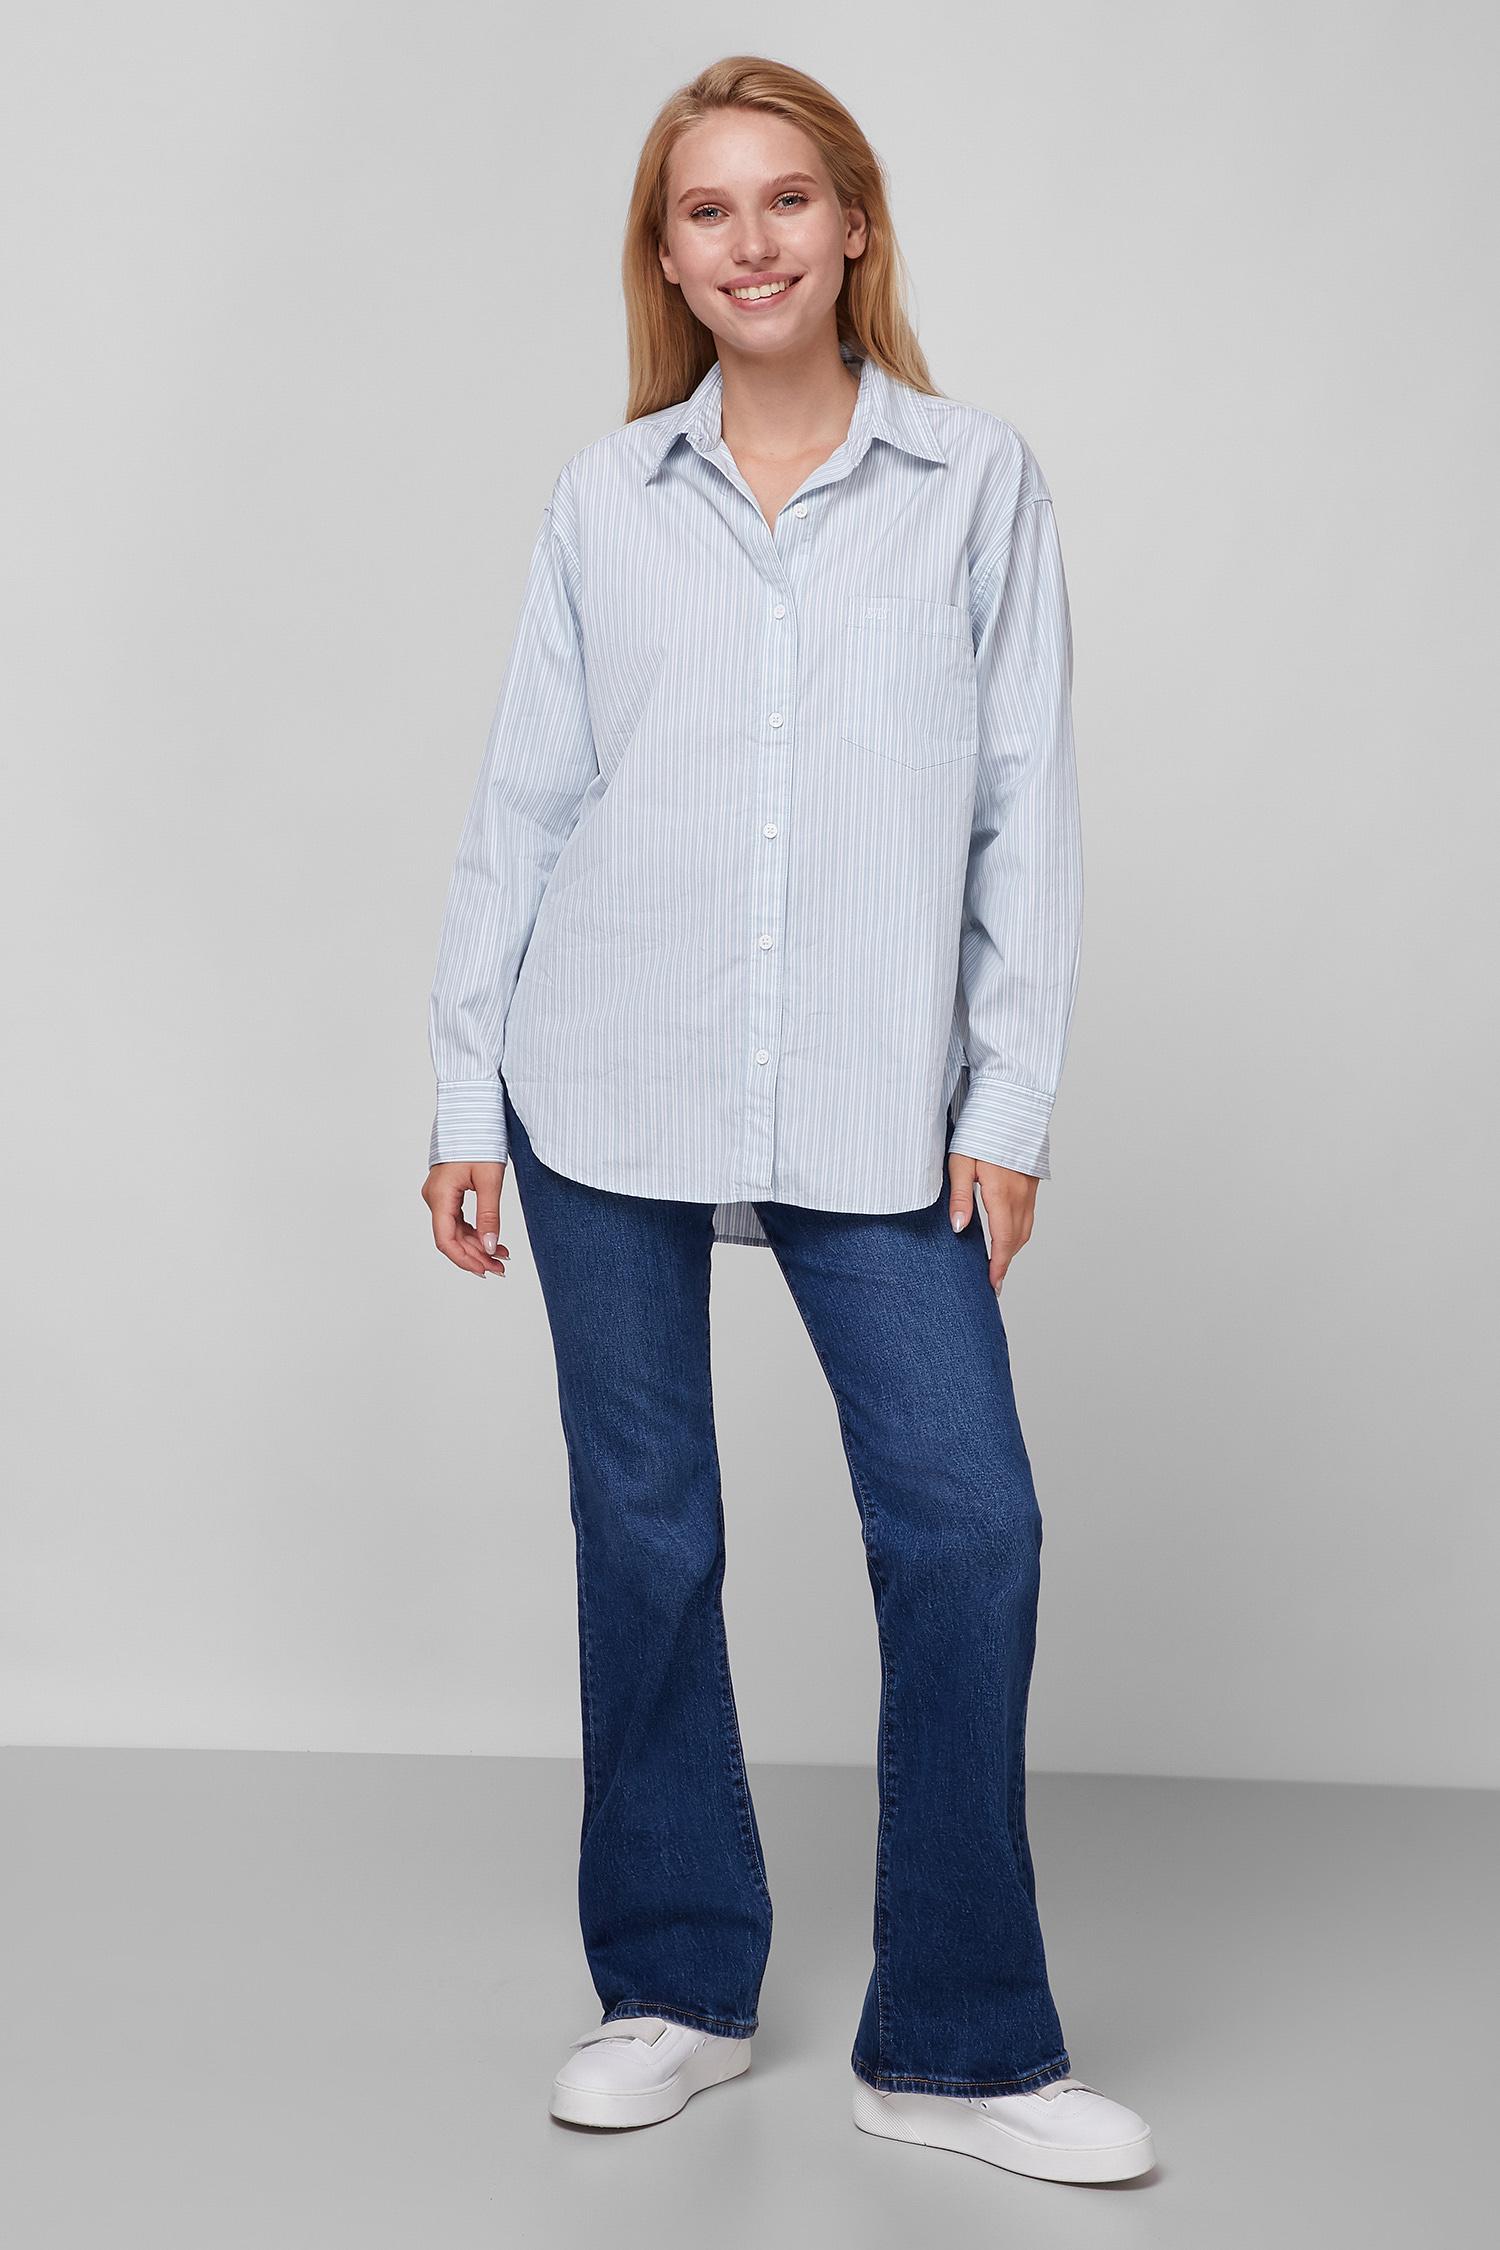 Жіноча сорочка у смужку Levis 85333;0002